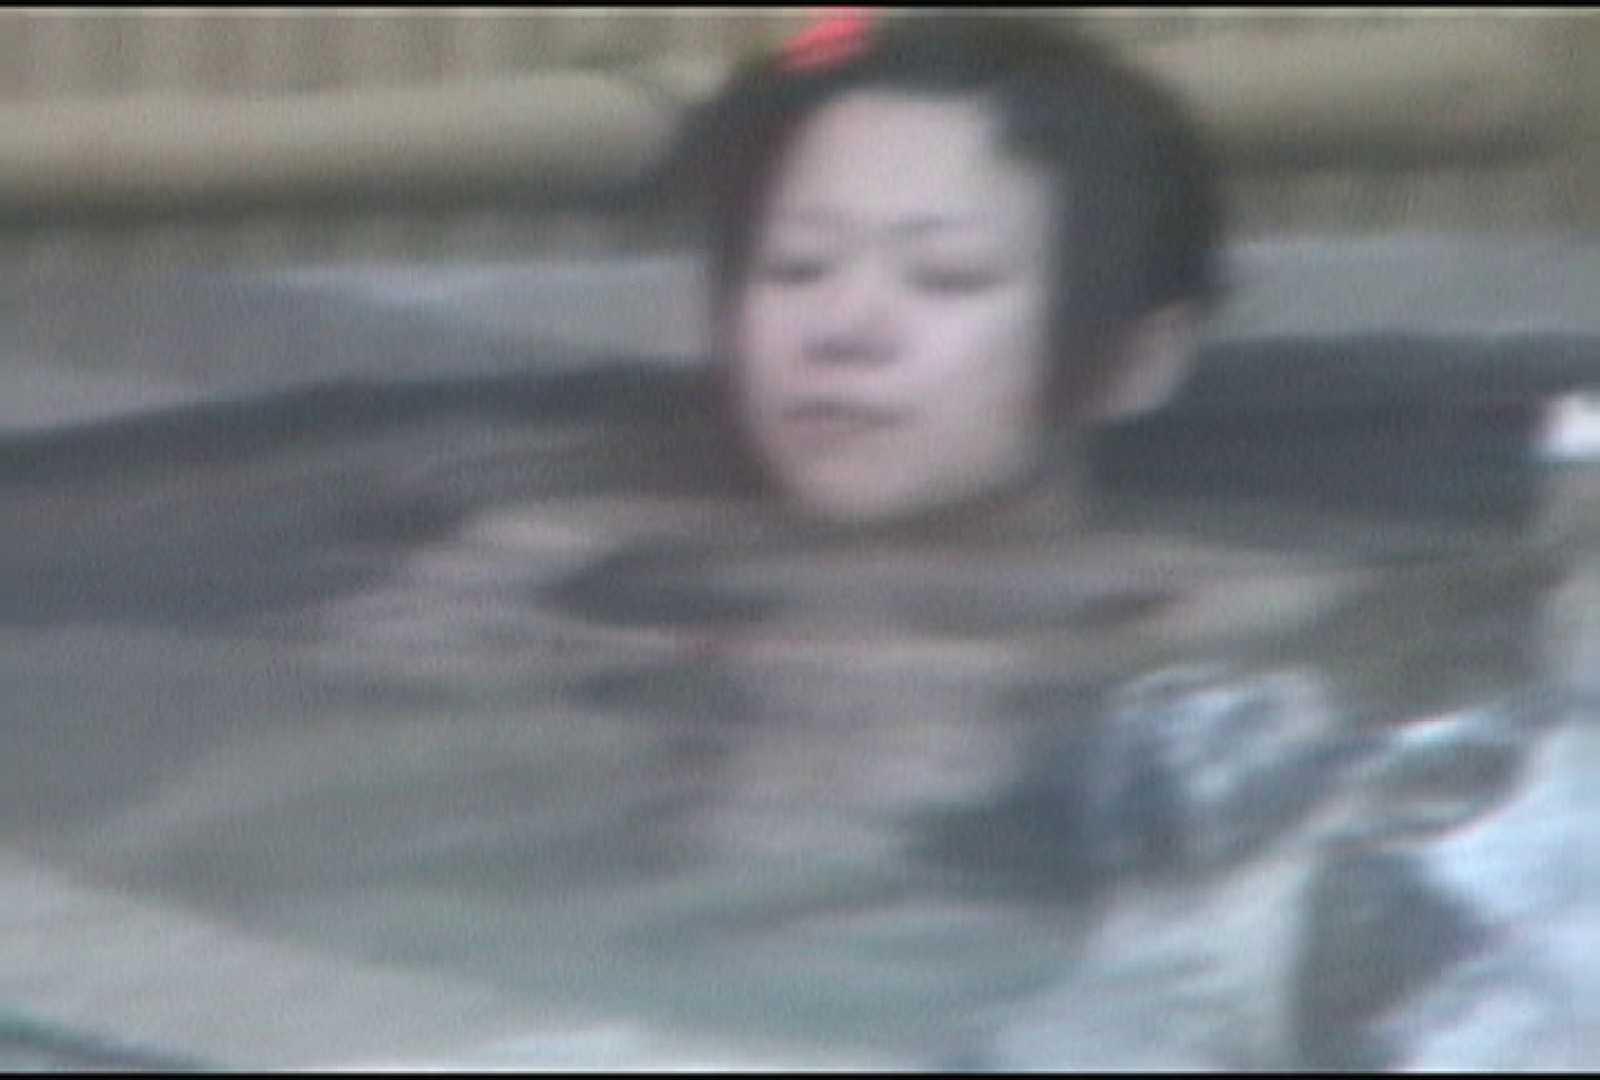 Aquaな露天風呂Vol.175 盗撮シリーズ | 露天風呂編  91PIX 31